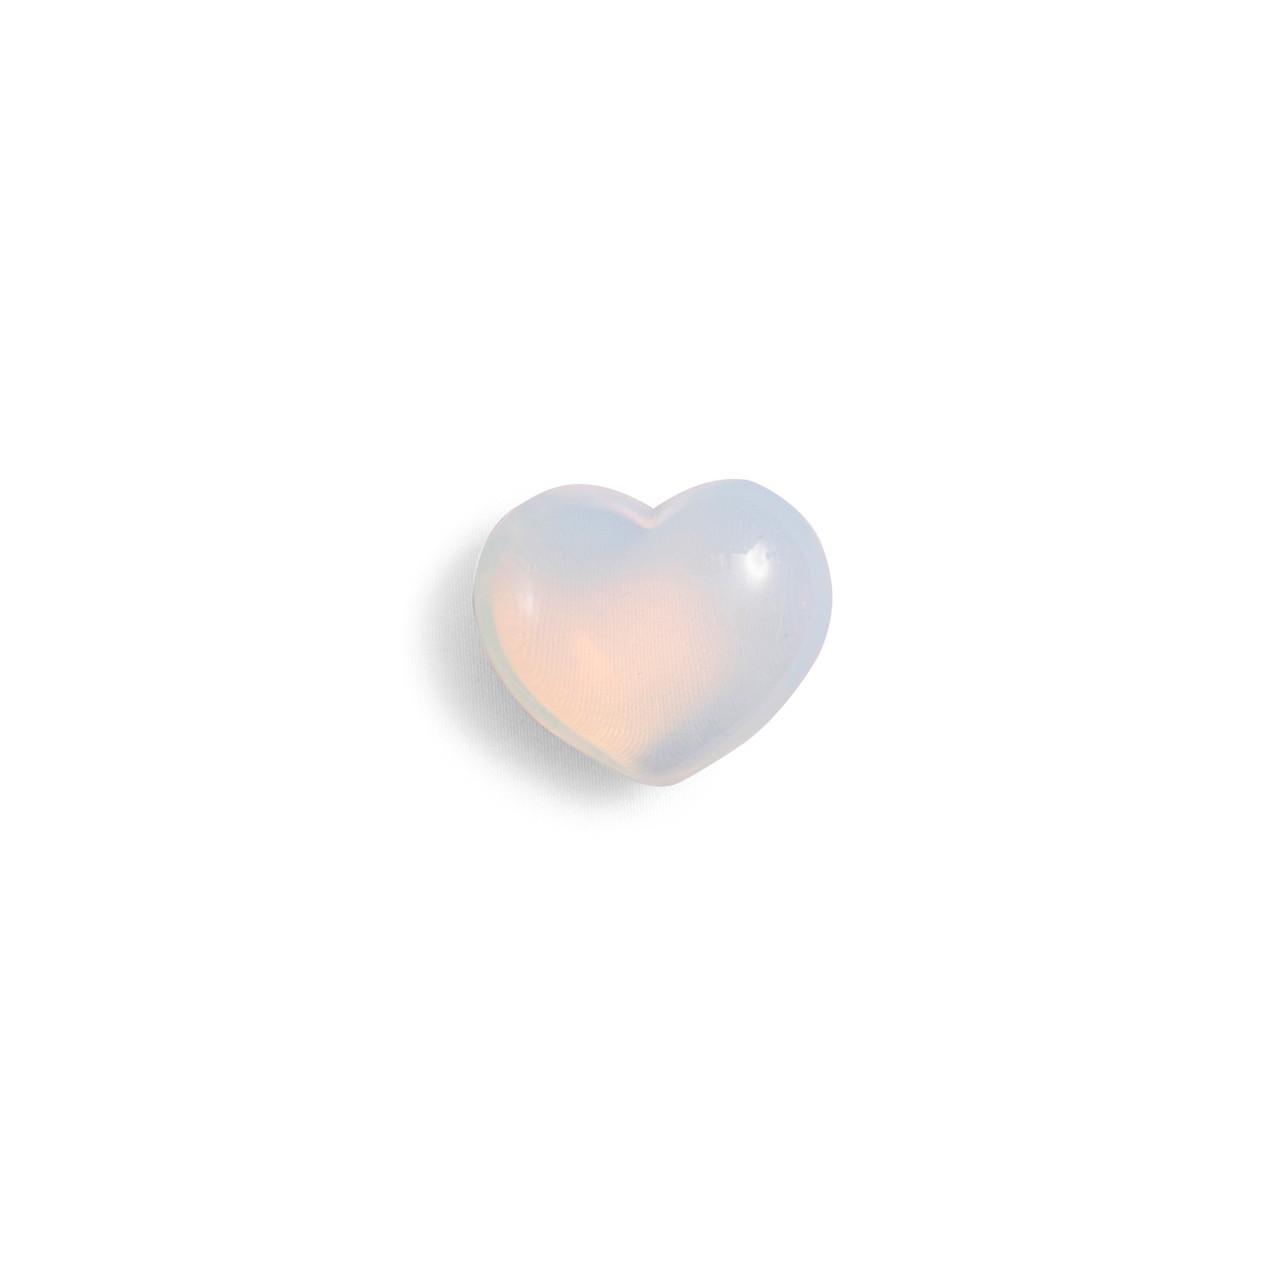 Opalite Mini Heart Shaped Stone